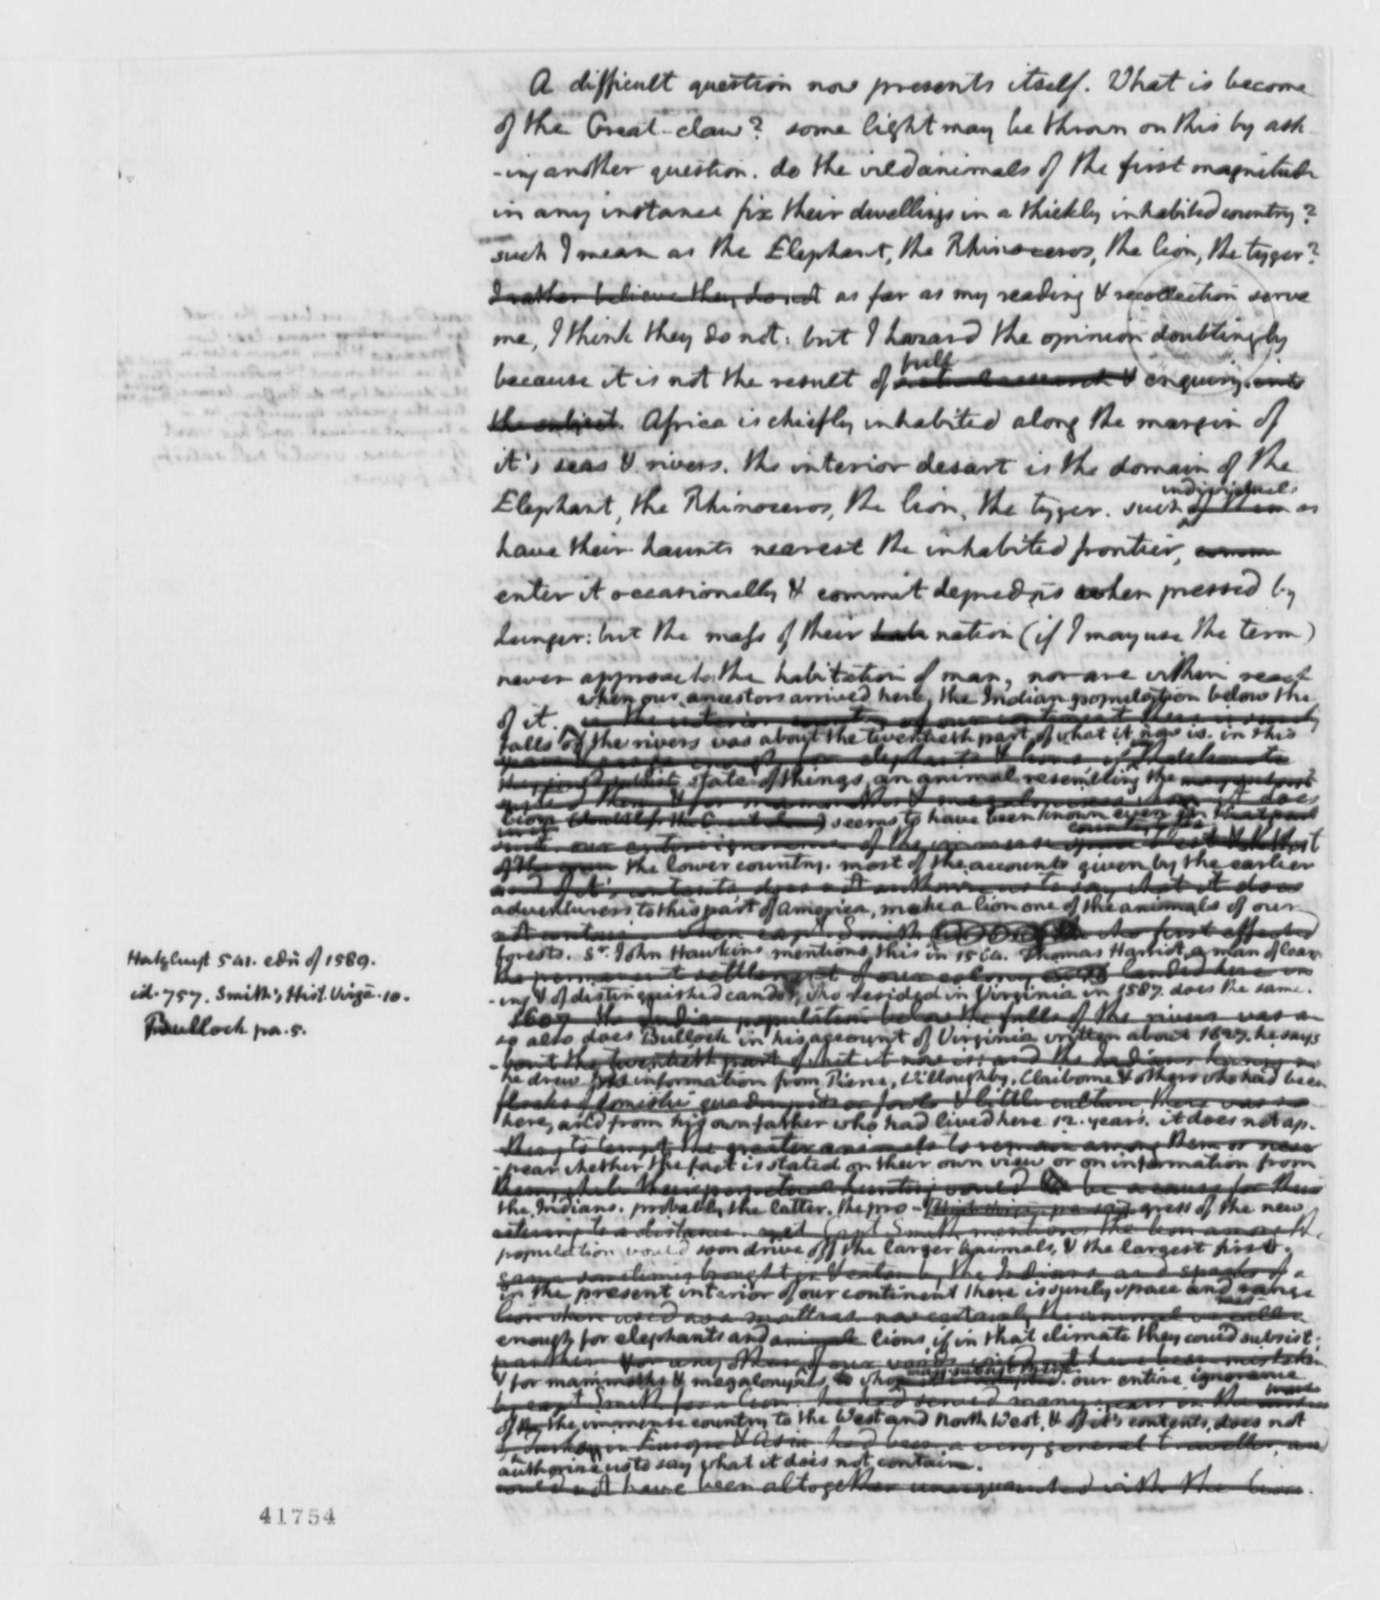 Thomas Jefferson to American Philosophical Society, 1799, Report